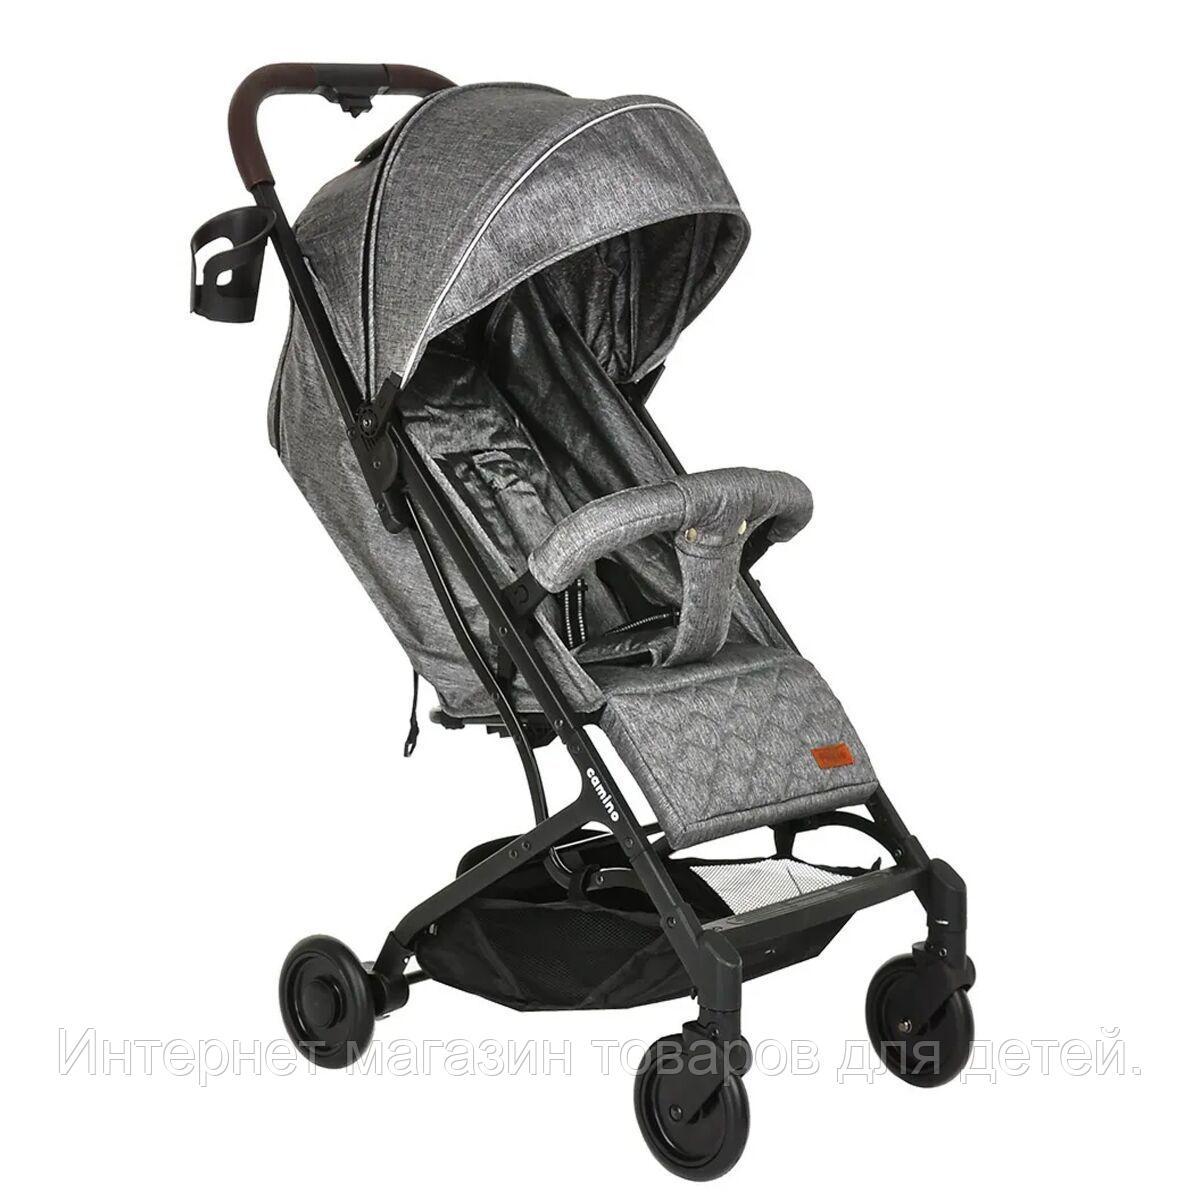 PITUSO Коляска детская CAMINO (прогулочная), Grey Metallic/Серый металлик